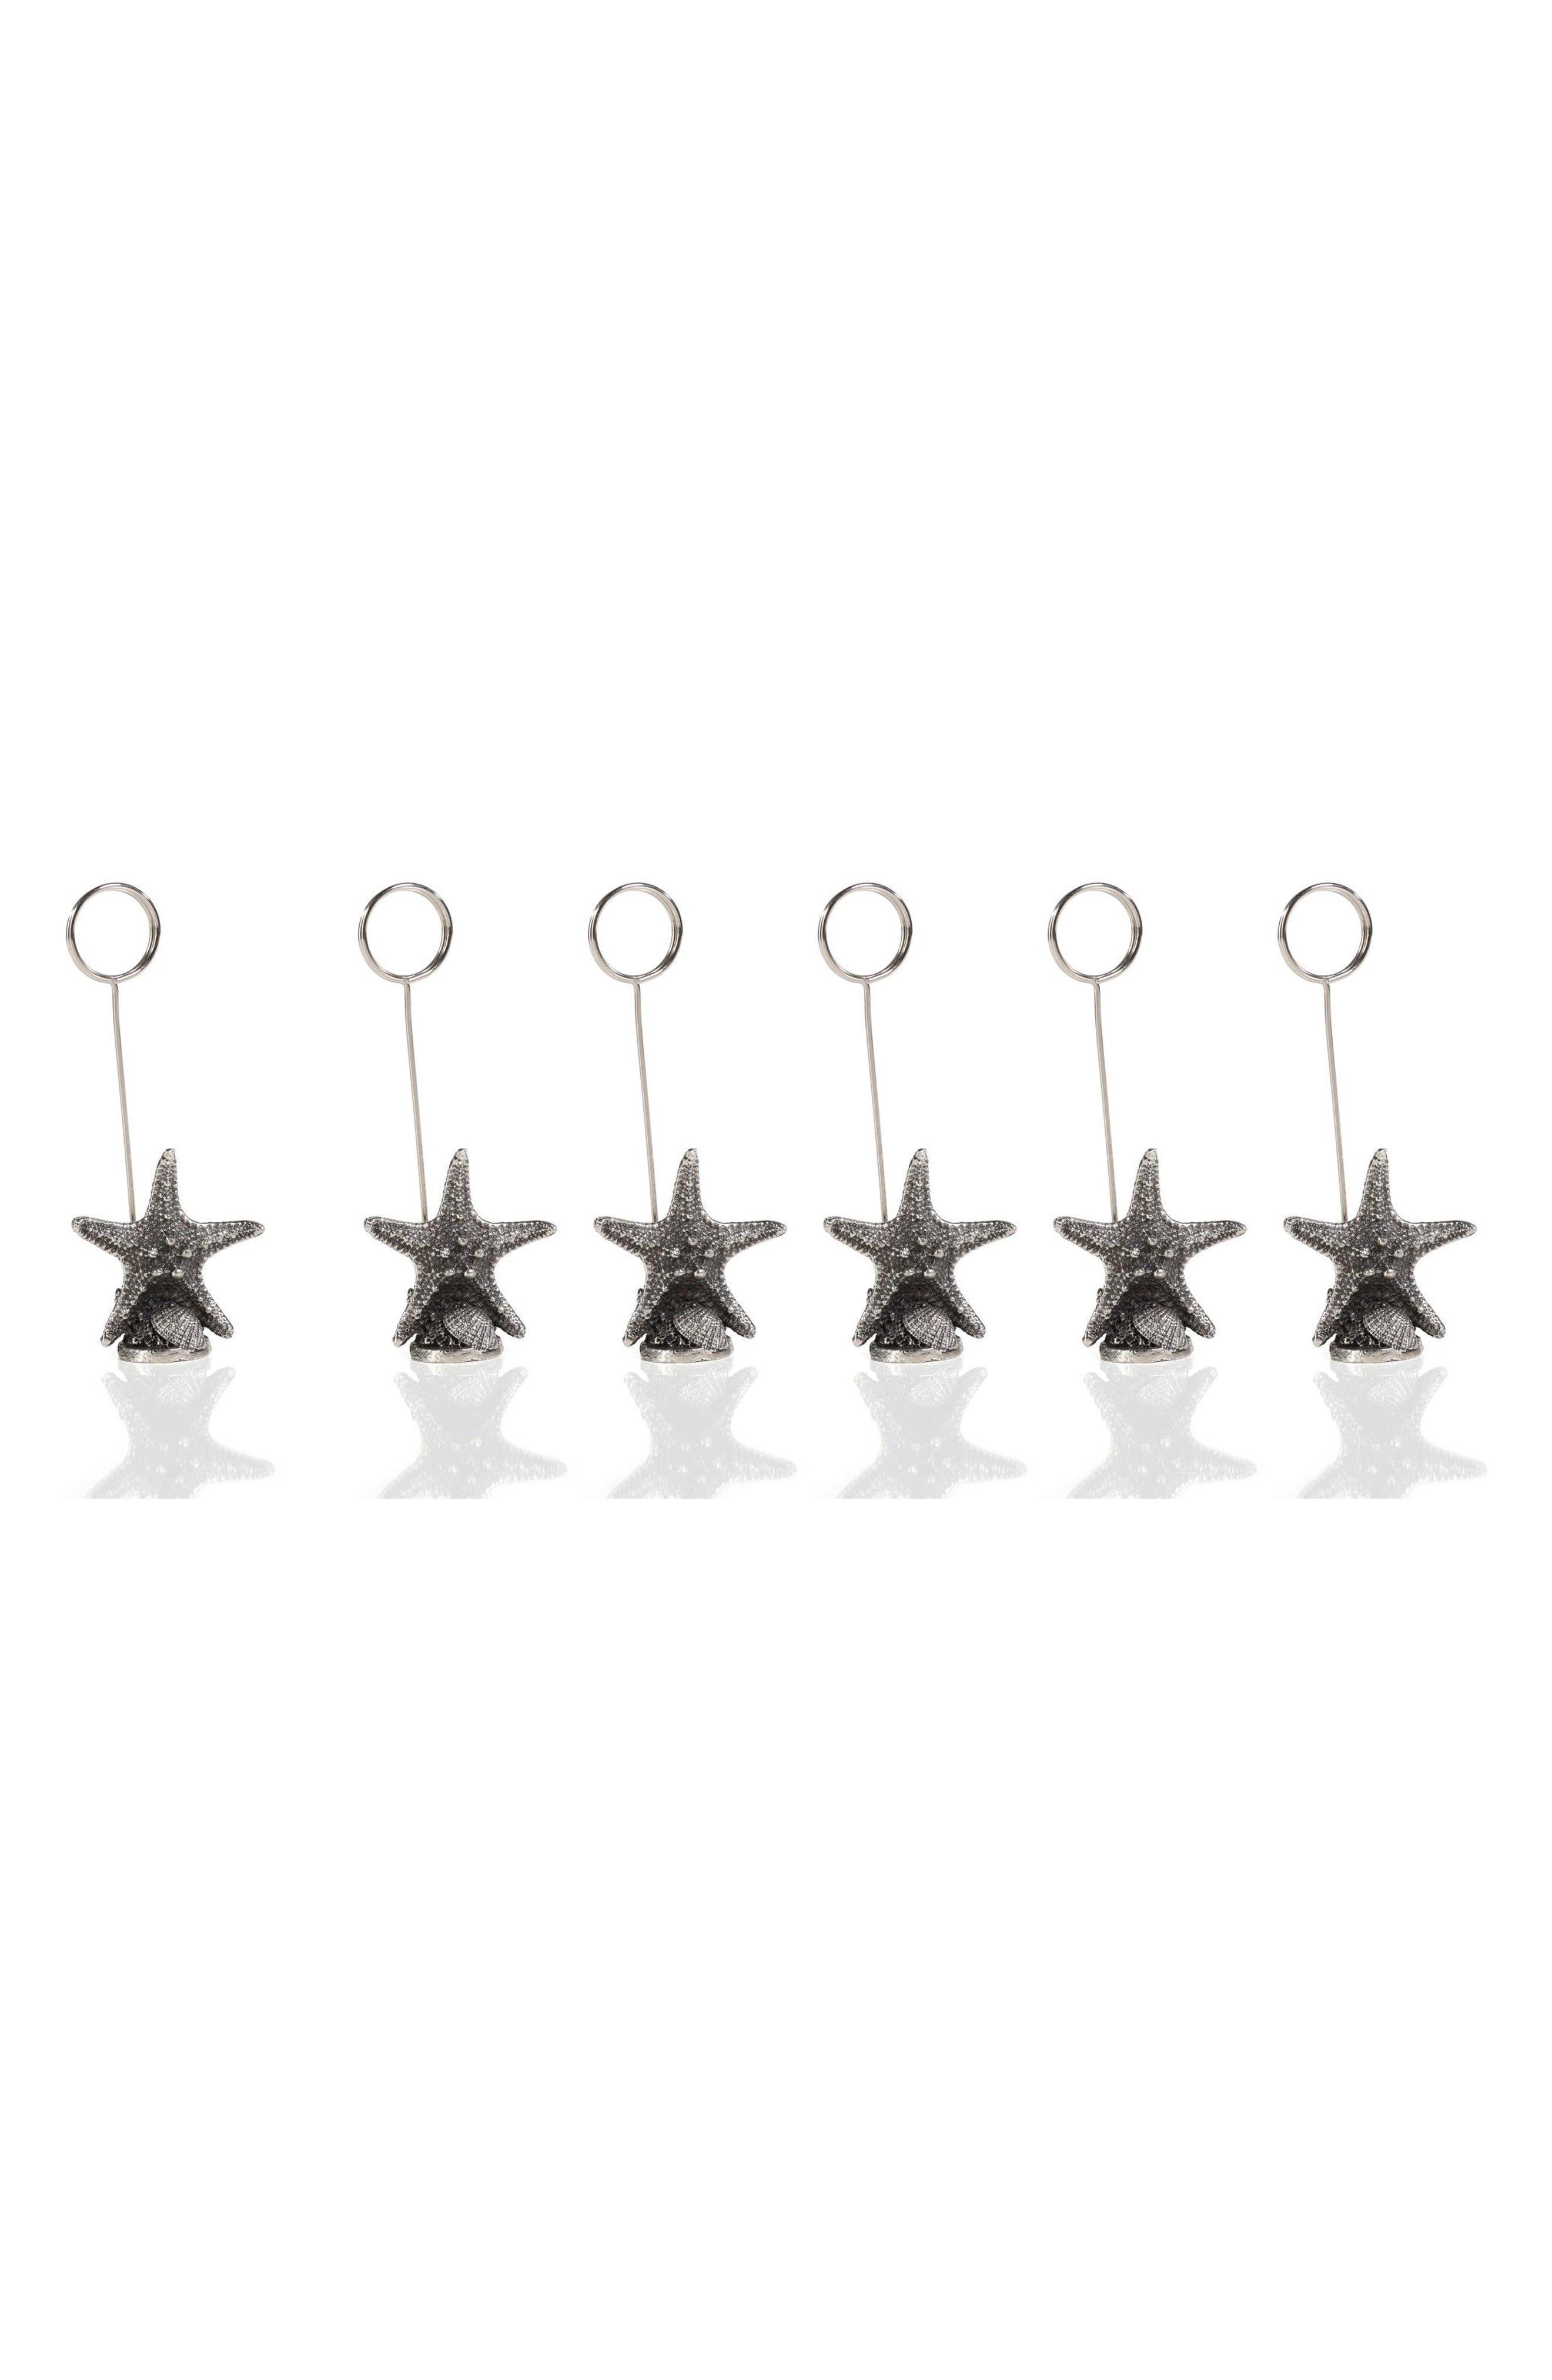 Set of 6 Starfish Name Card Holders,                             Main thumbnail 1, color,                             Grey/ Silver